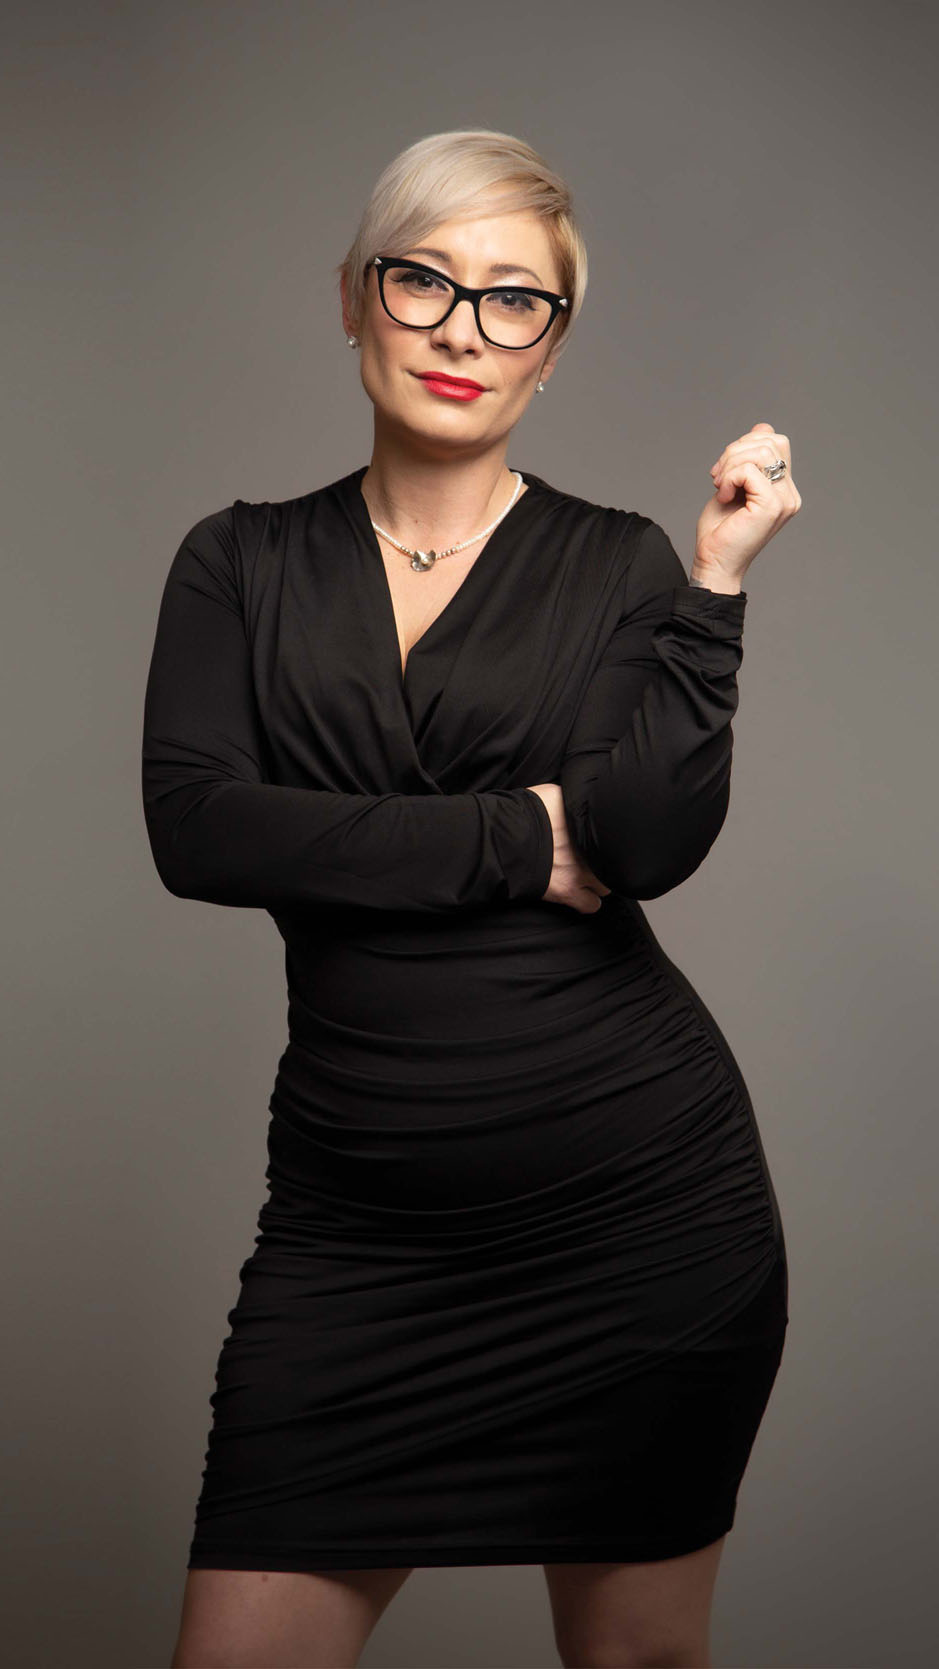 Sarah Manowitz